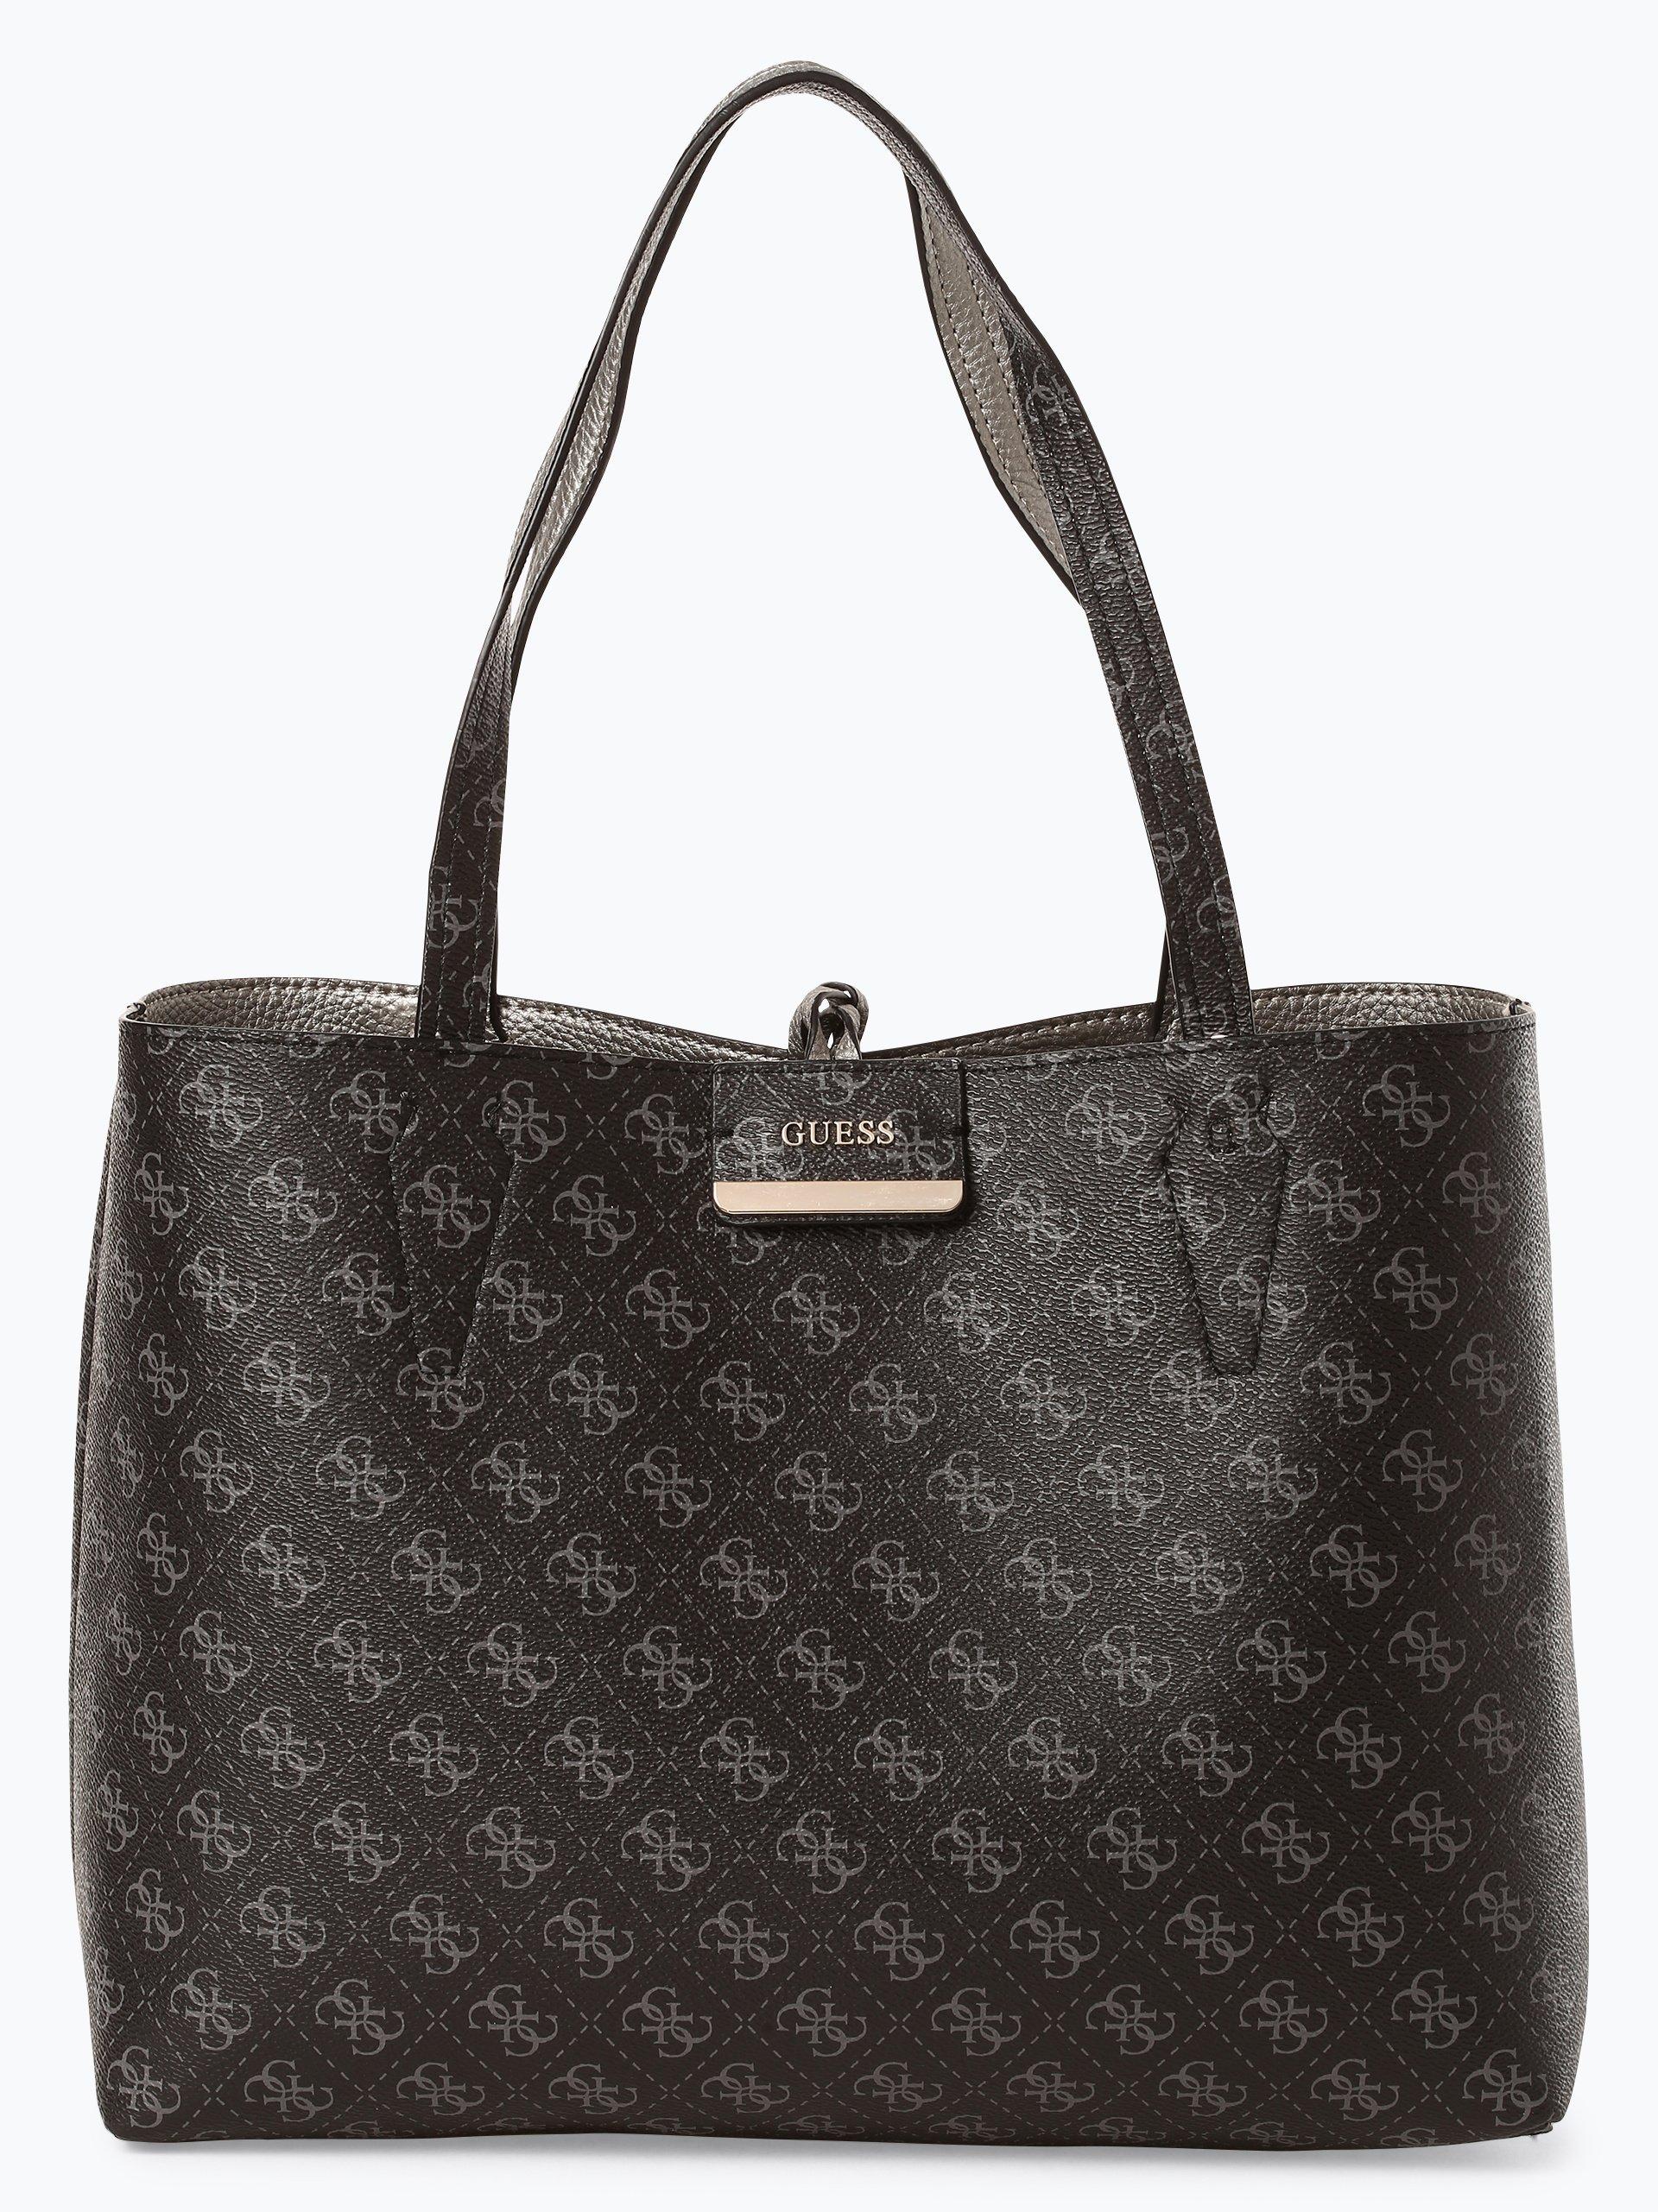 Guess Jeans Damen Wende-Shopper mit Handtasche